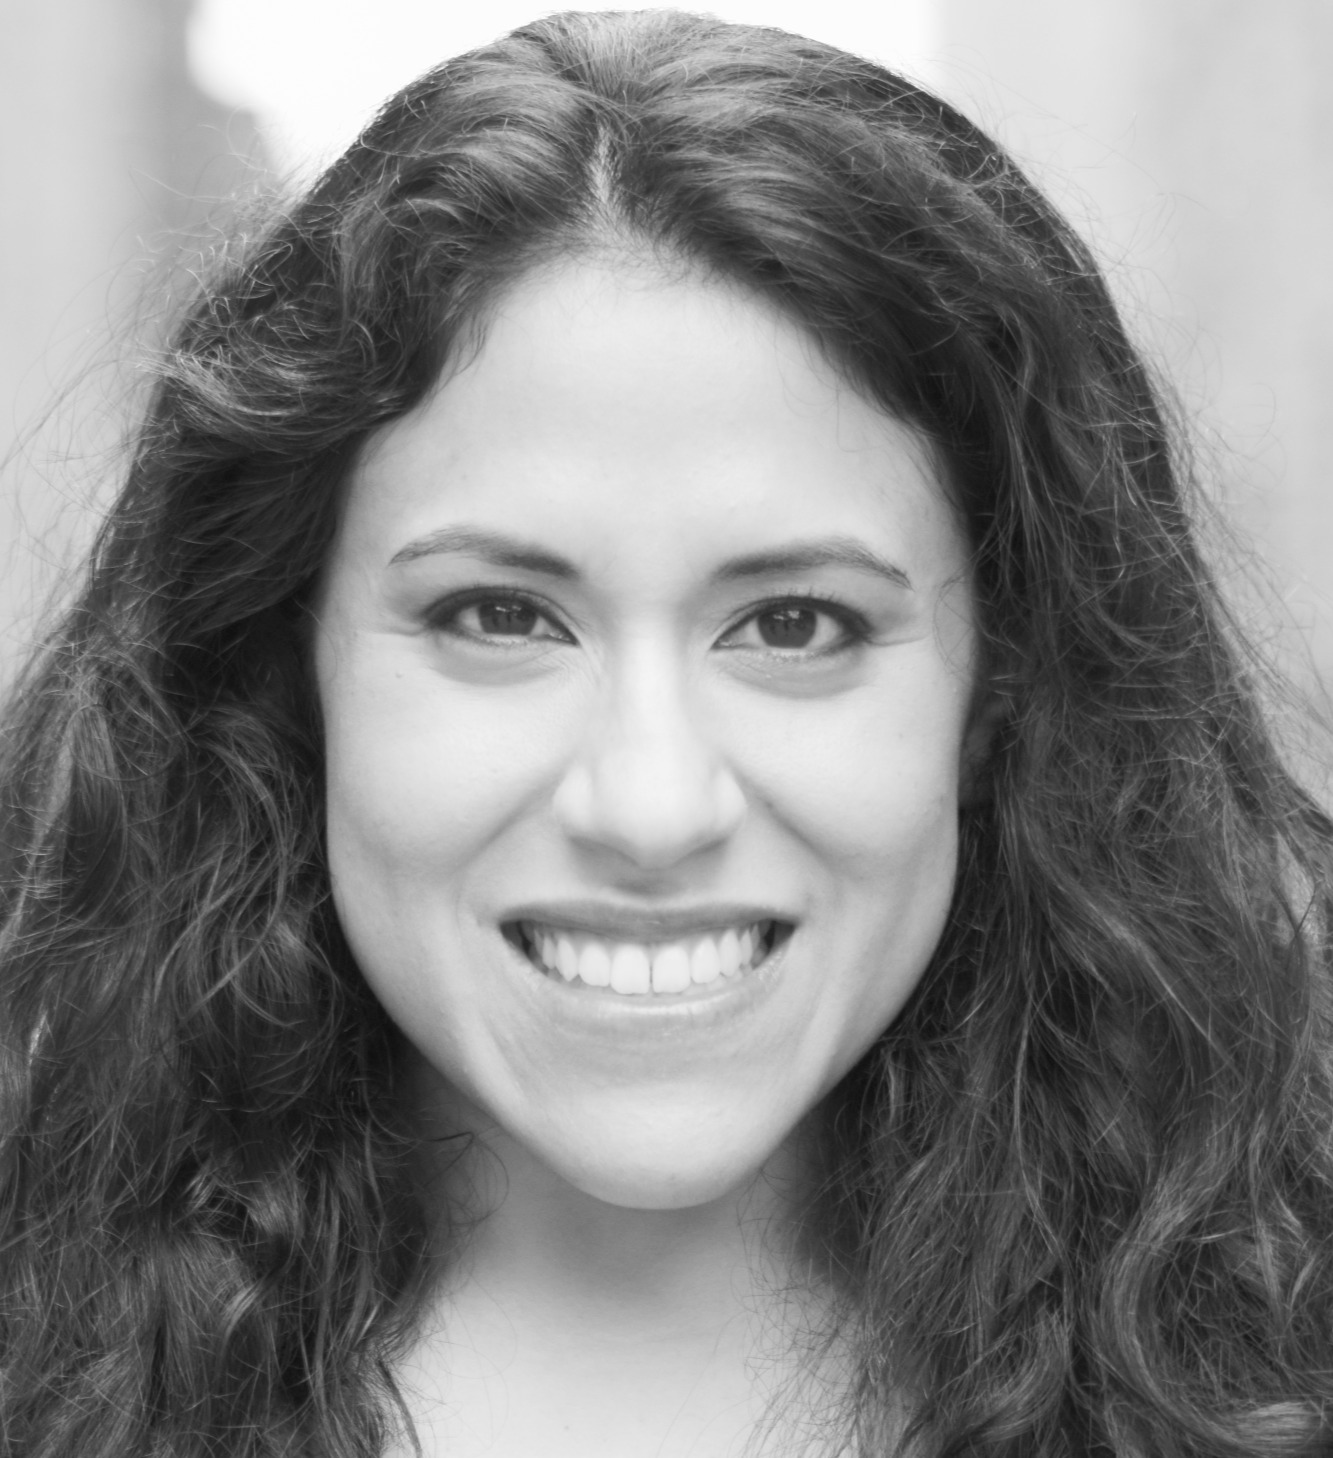 Sofia Bengoa